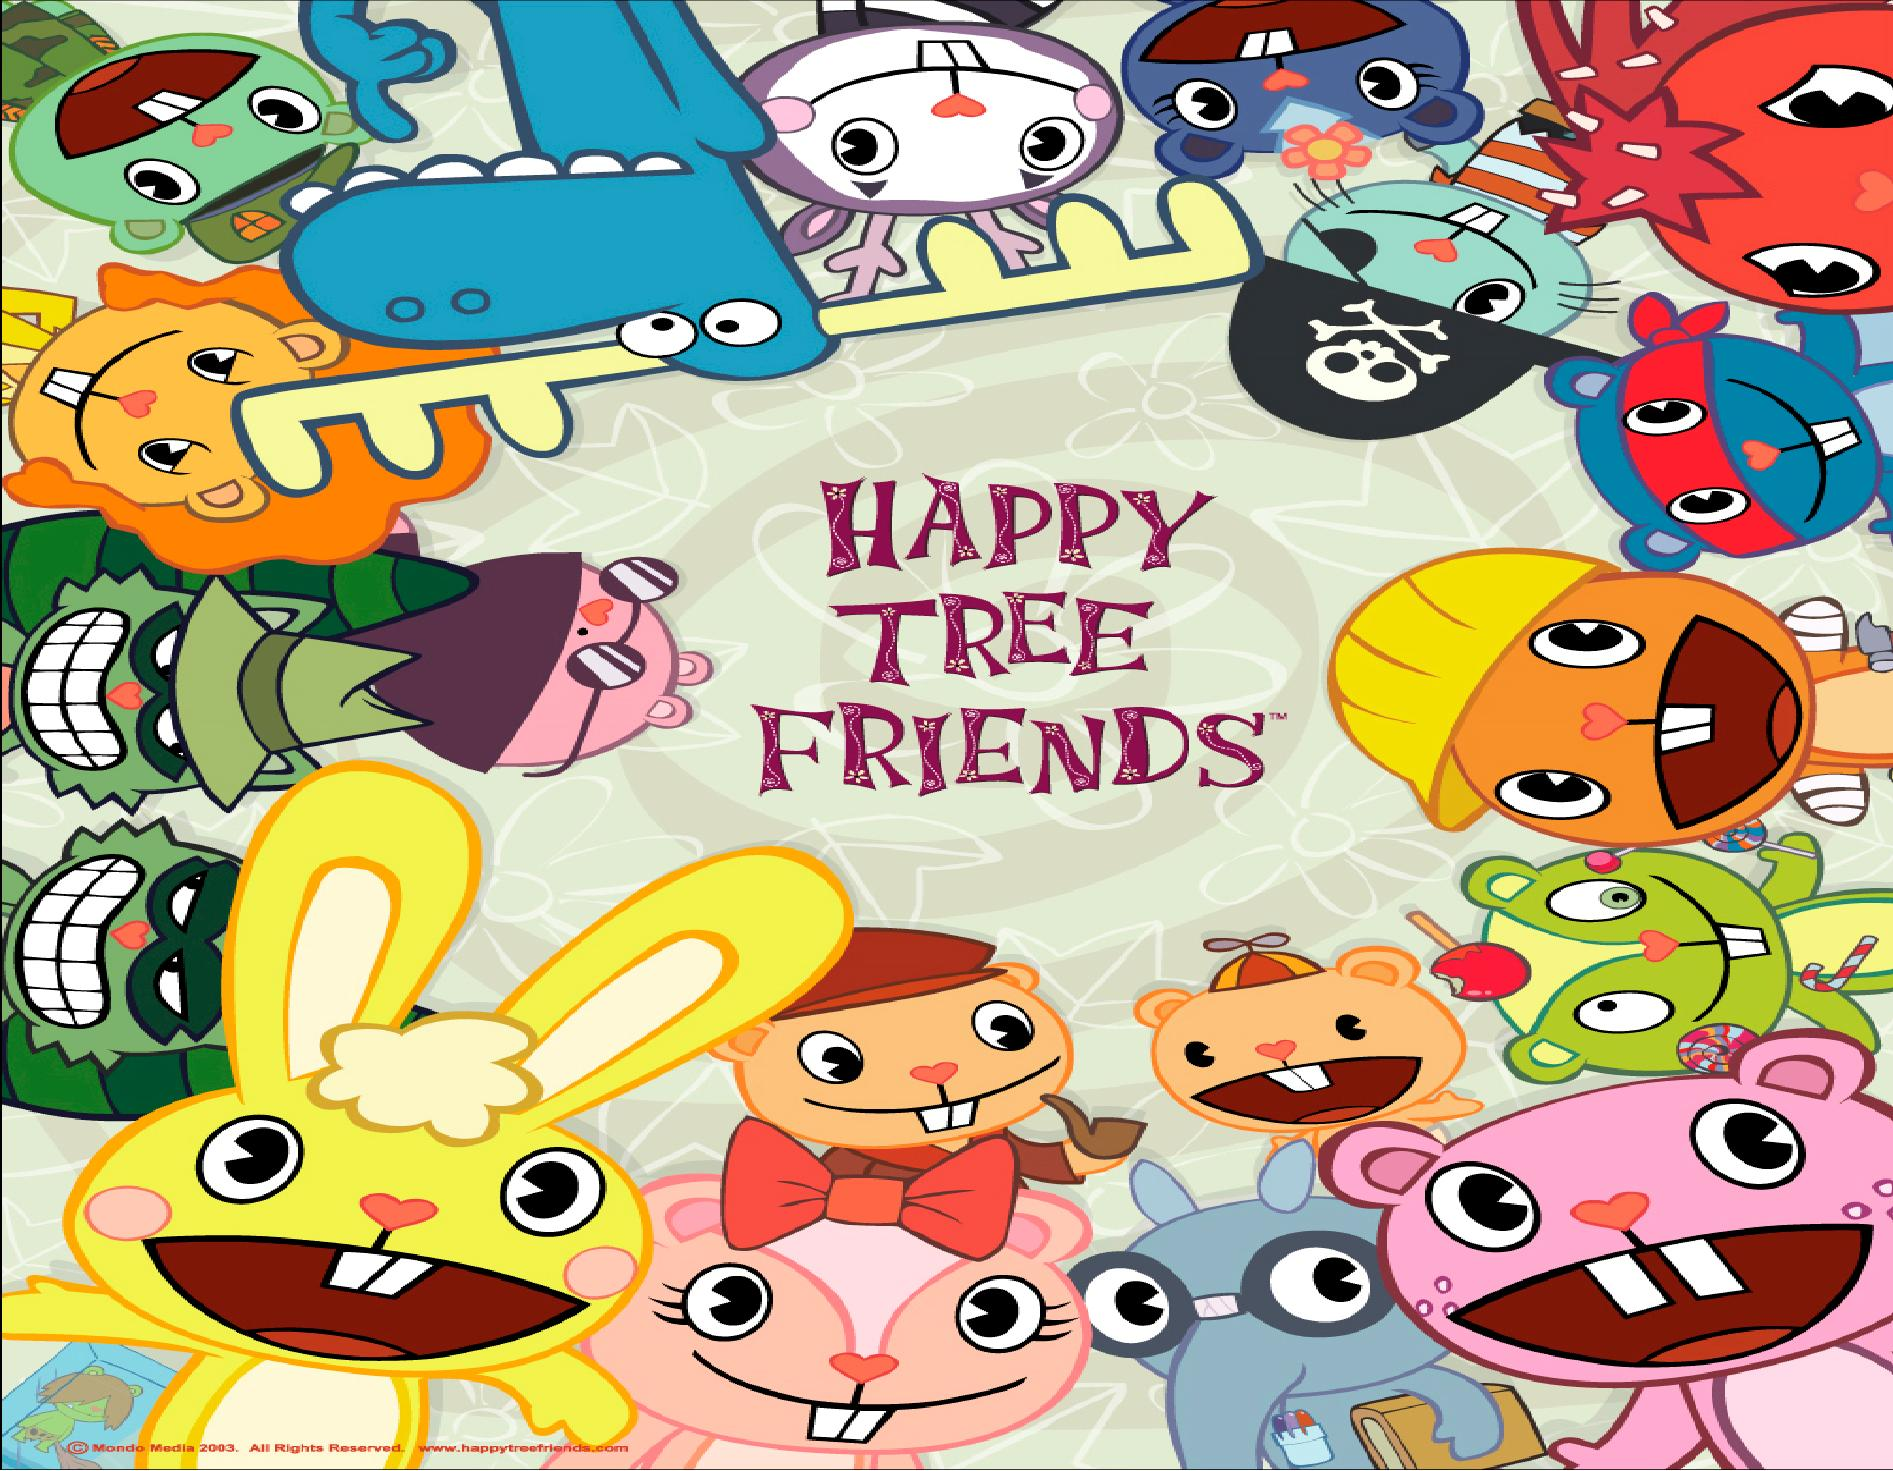 Happy Tree Friends wallpaper   ForWallpapercom 1893x1471